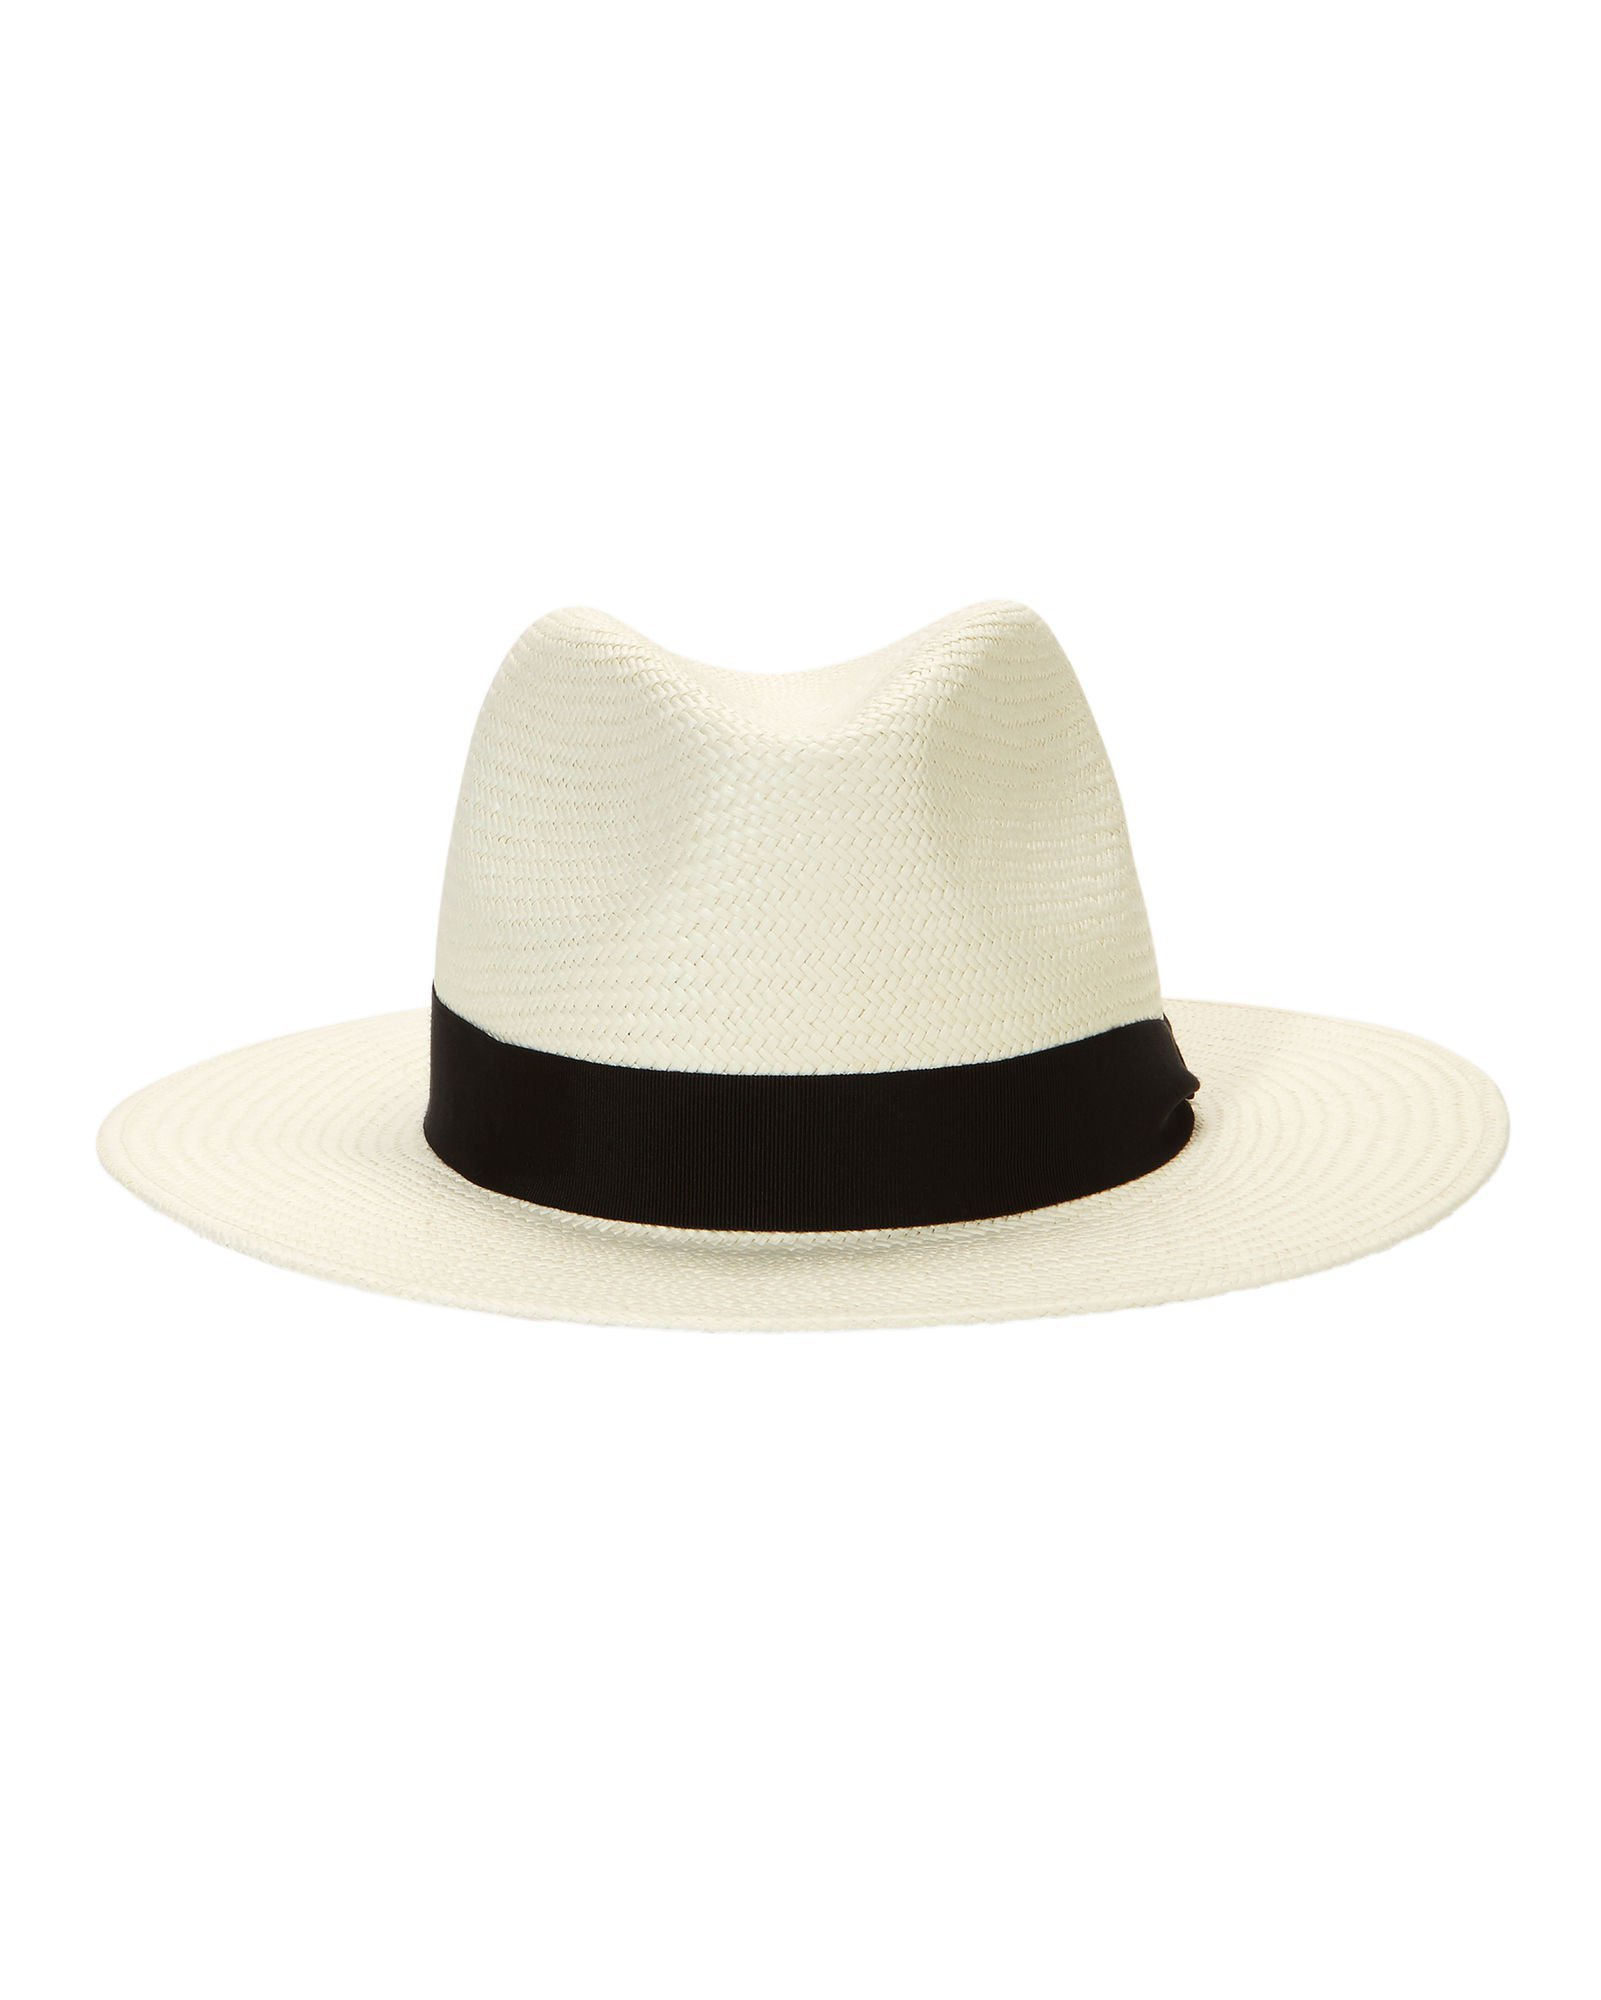 Rag & Bone White Panama Hat - INTERMIX®